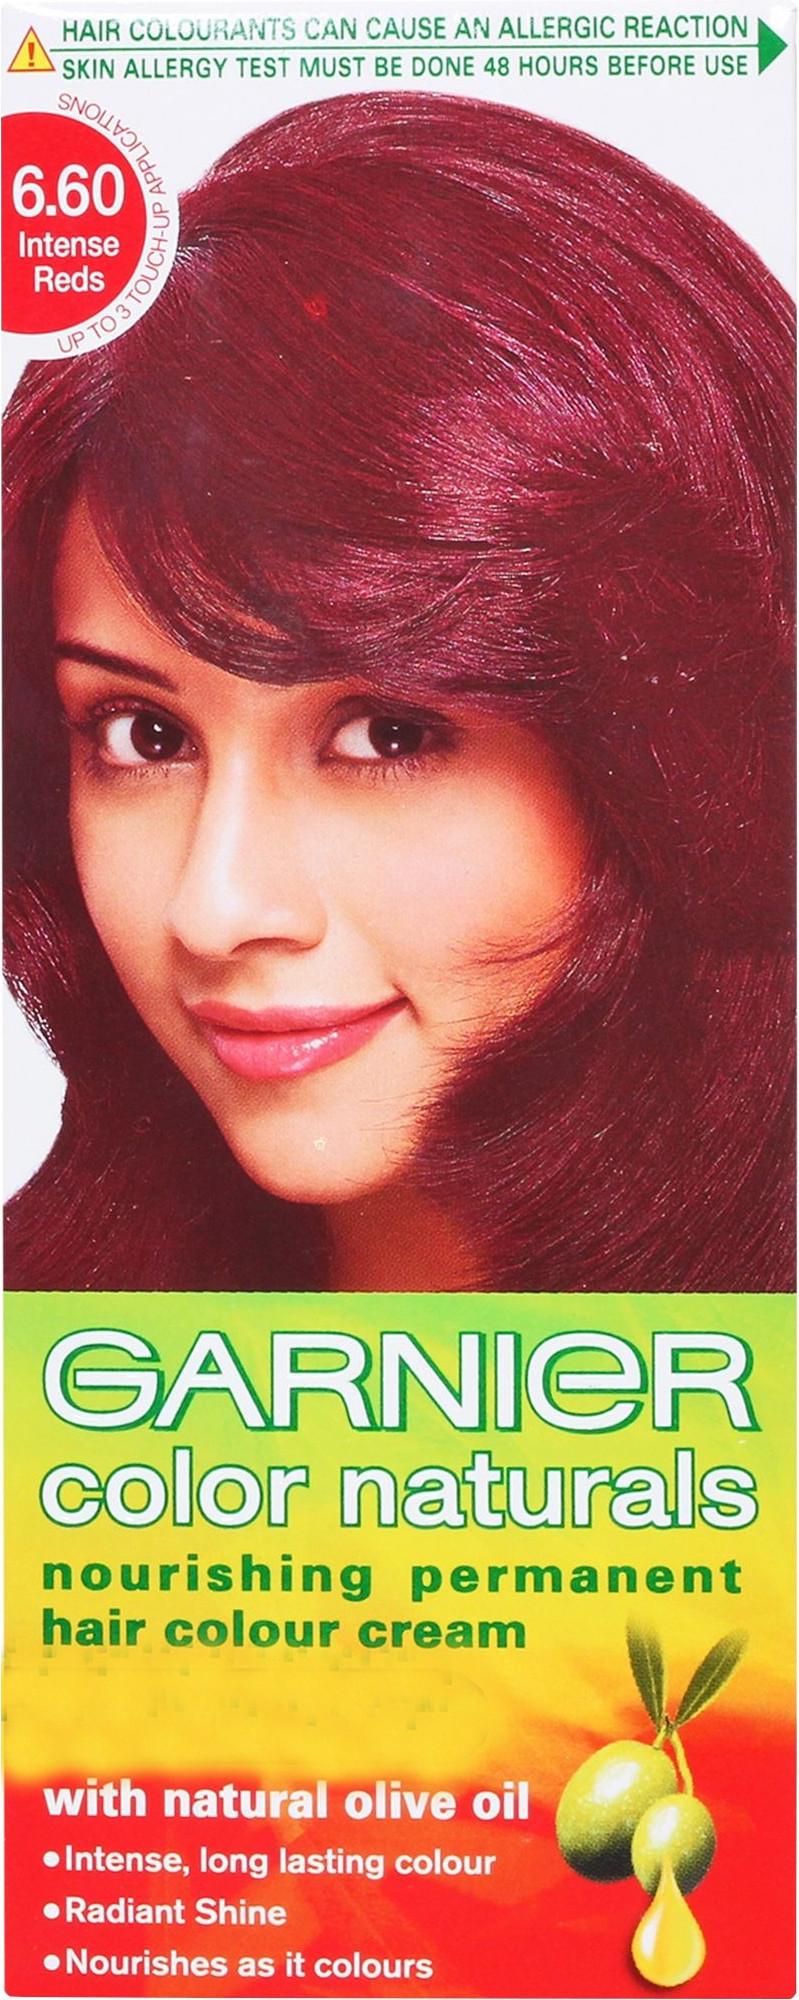 Buy Garnier Color Naturals Hair Intense Reds 660 160